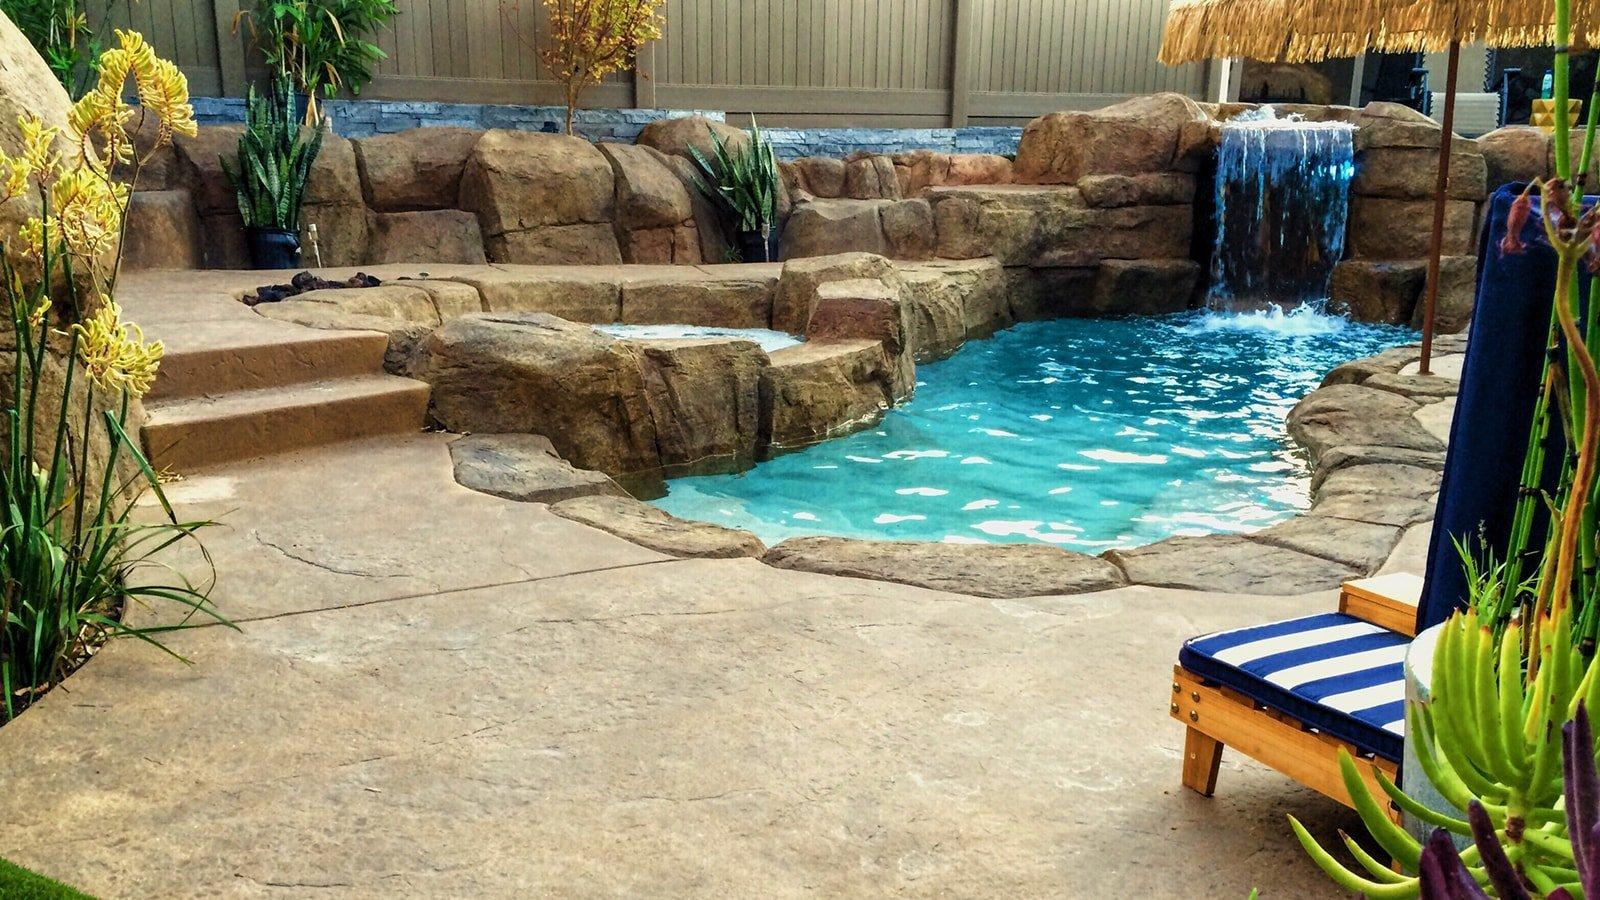 Backyard with beautiful hot tub and pool